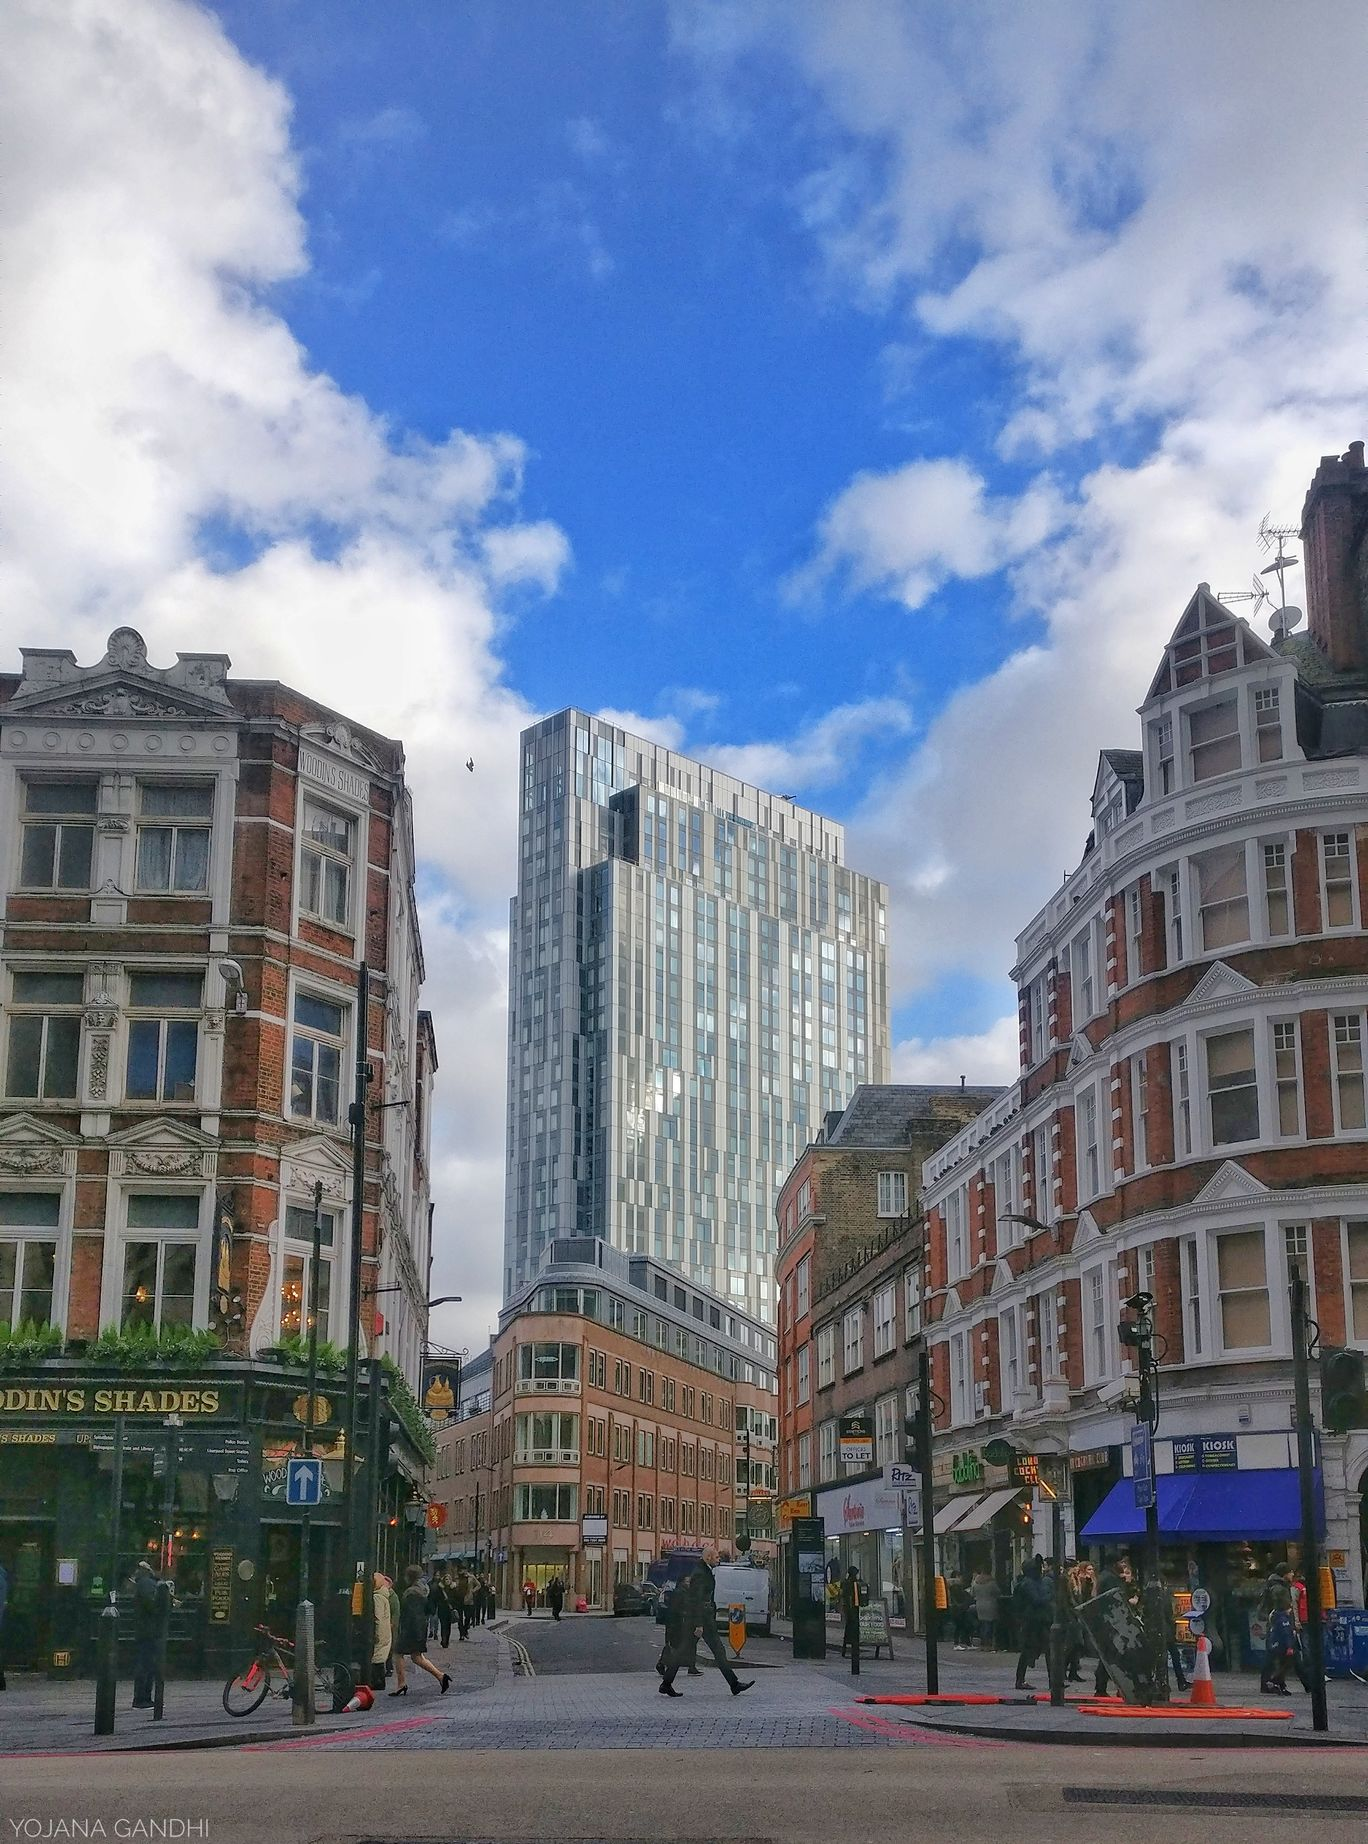 Photo of London By Yojana